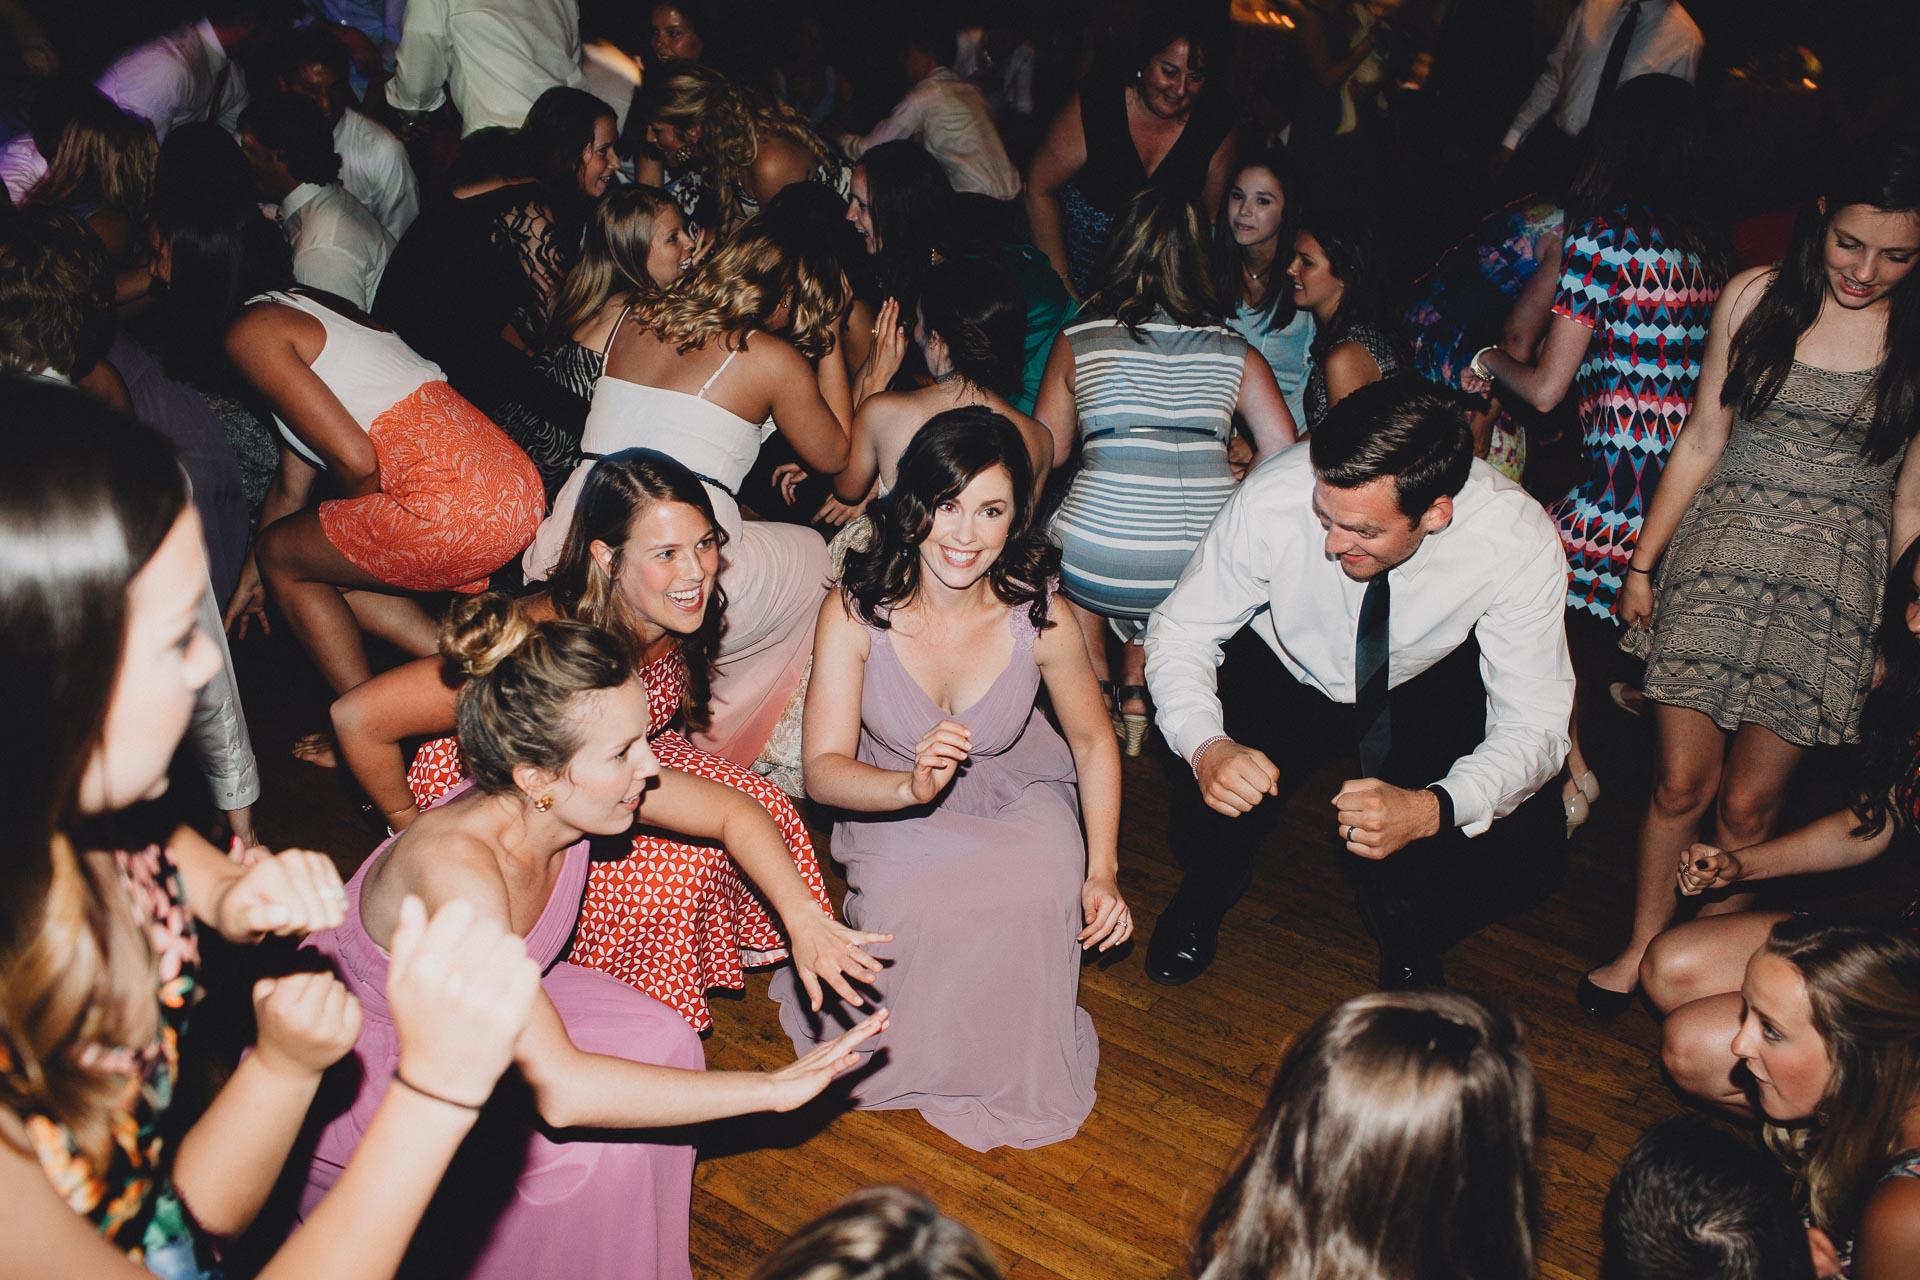 Julia-Michael-Cincinnati-Music-Hall-Wedding-131@2x.jpg